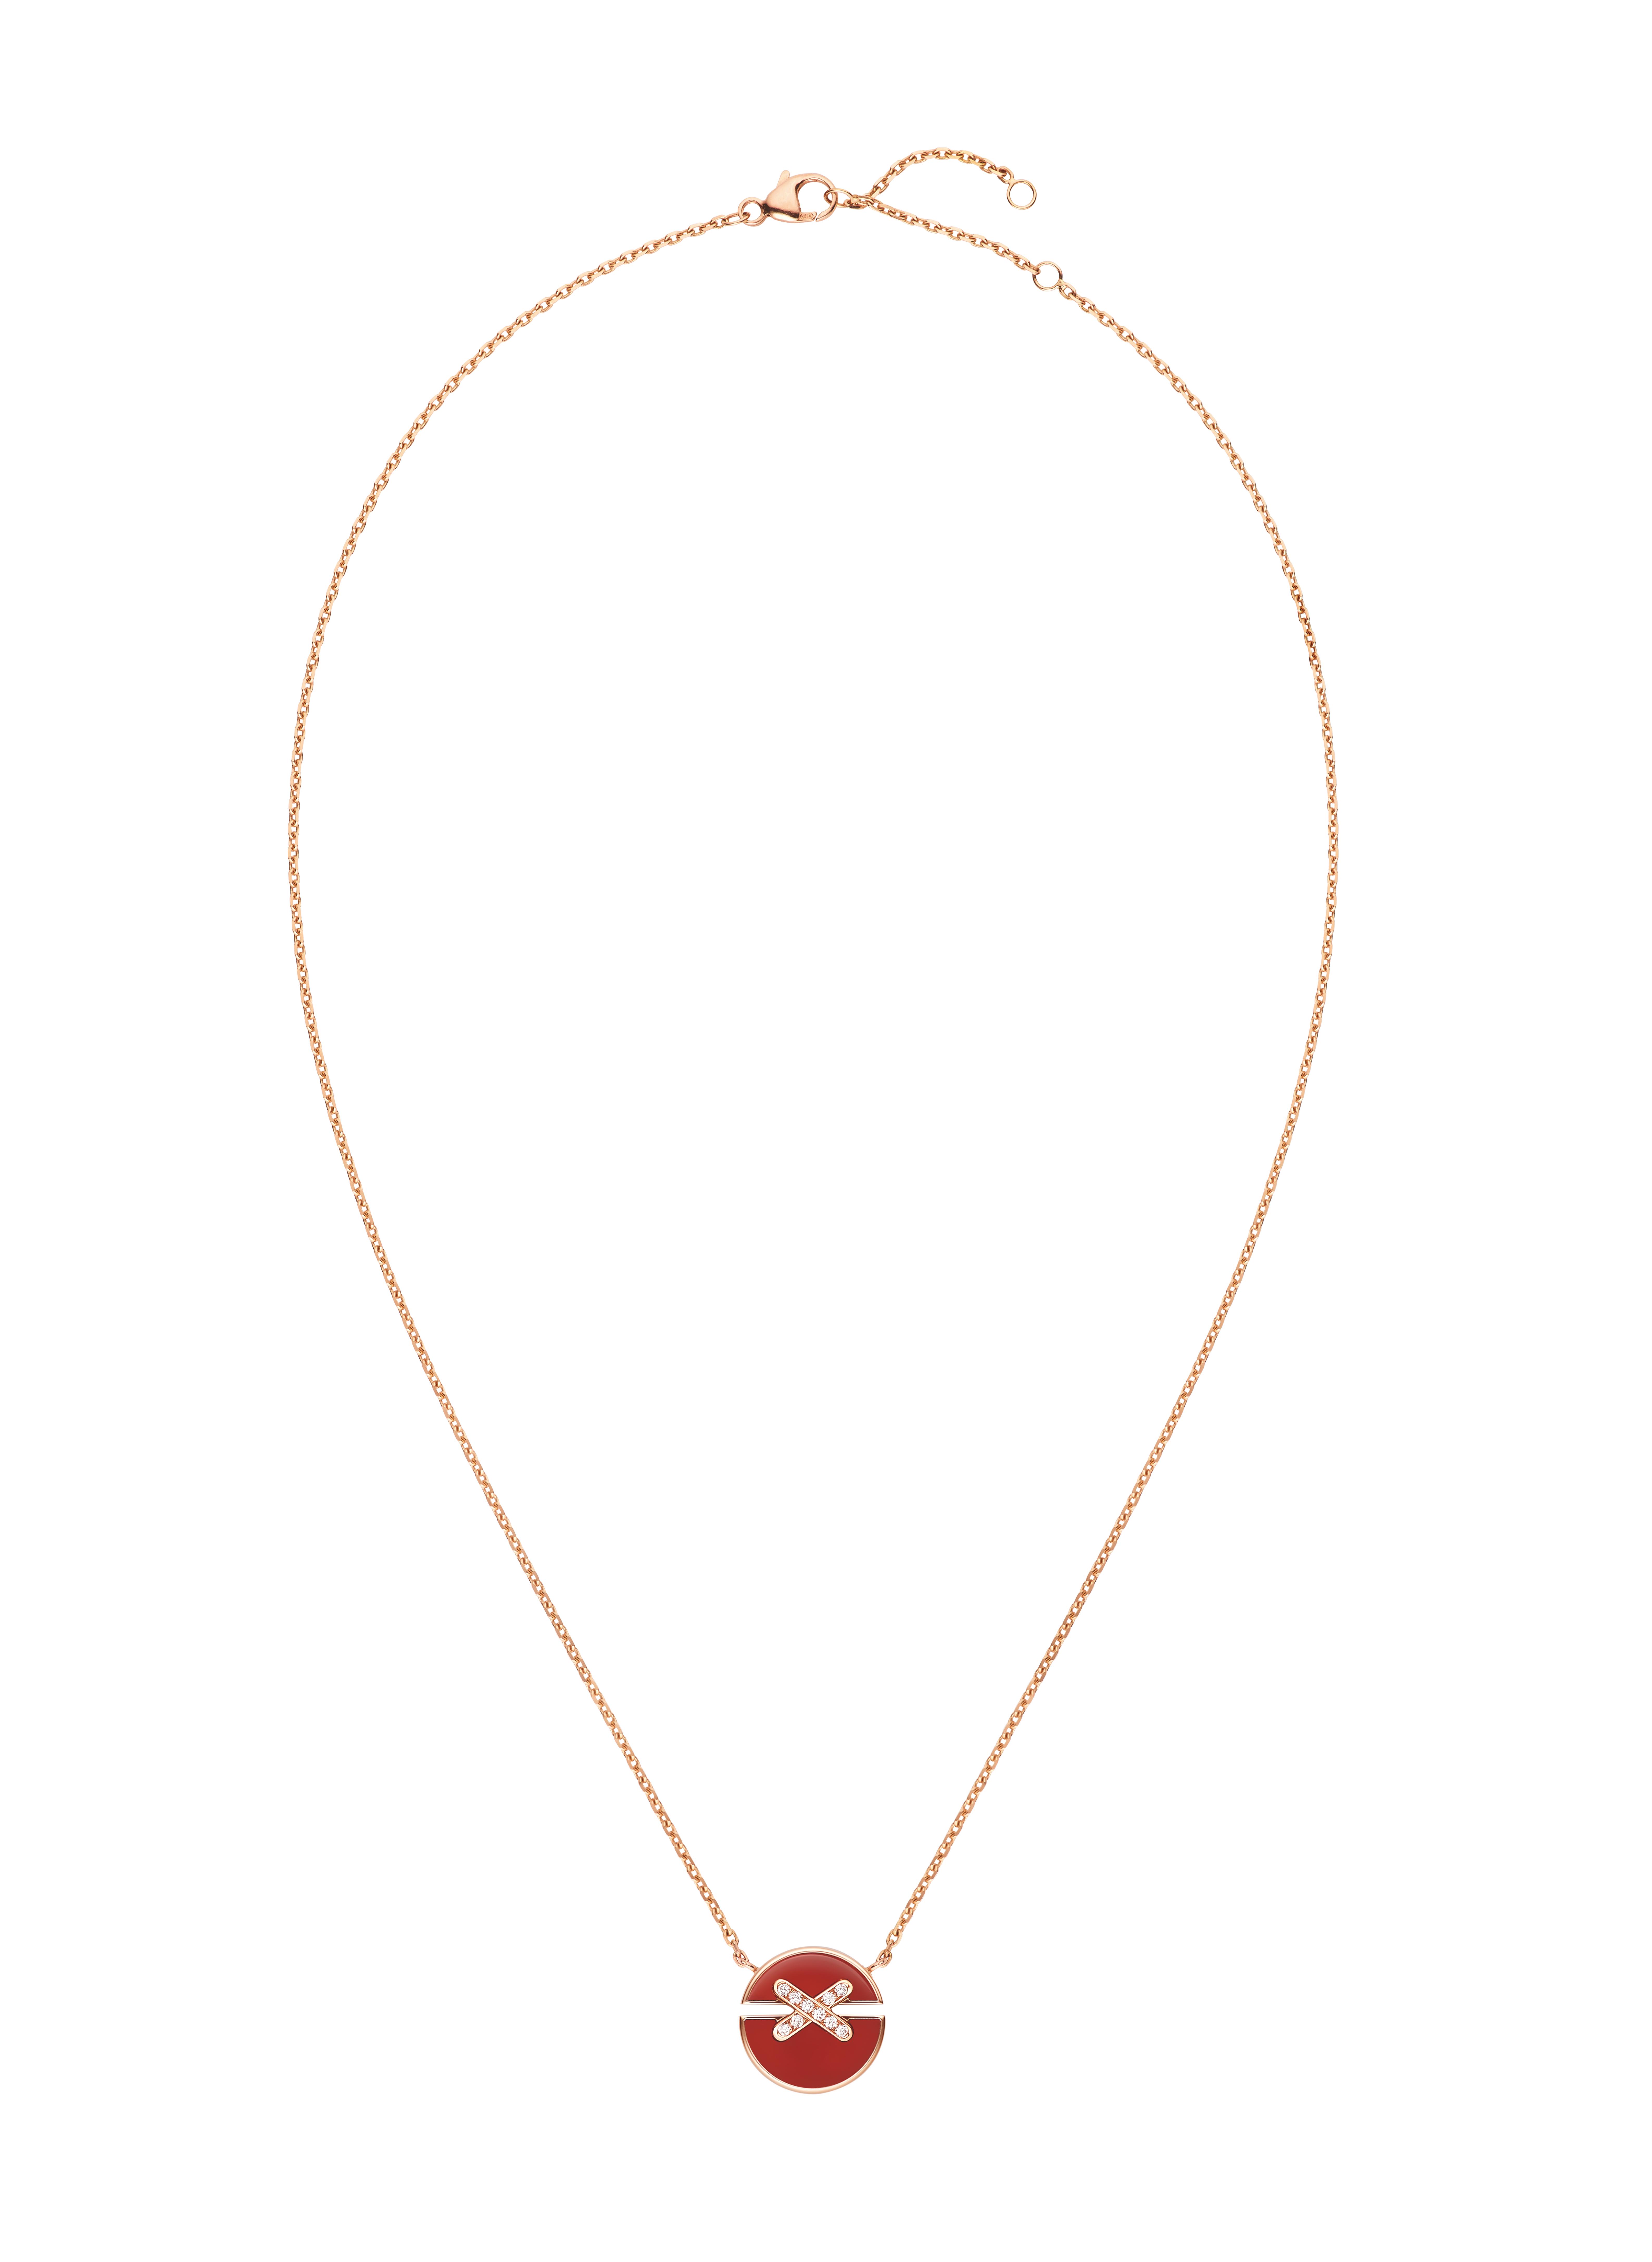 Chaumet Jeux de Liens Harmony Medallion in rose gold, brilliant-cut diamonds and carnelian (Photo credit: Chaumet)